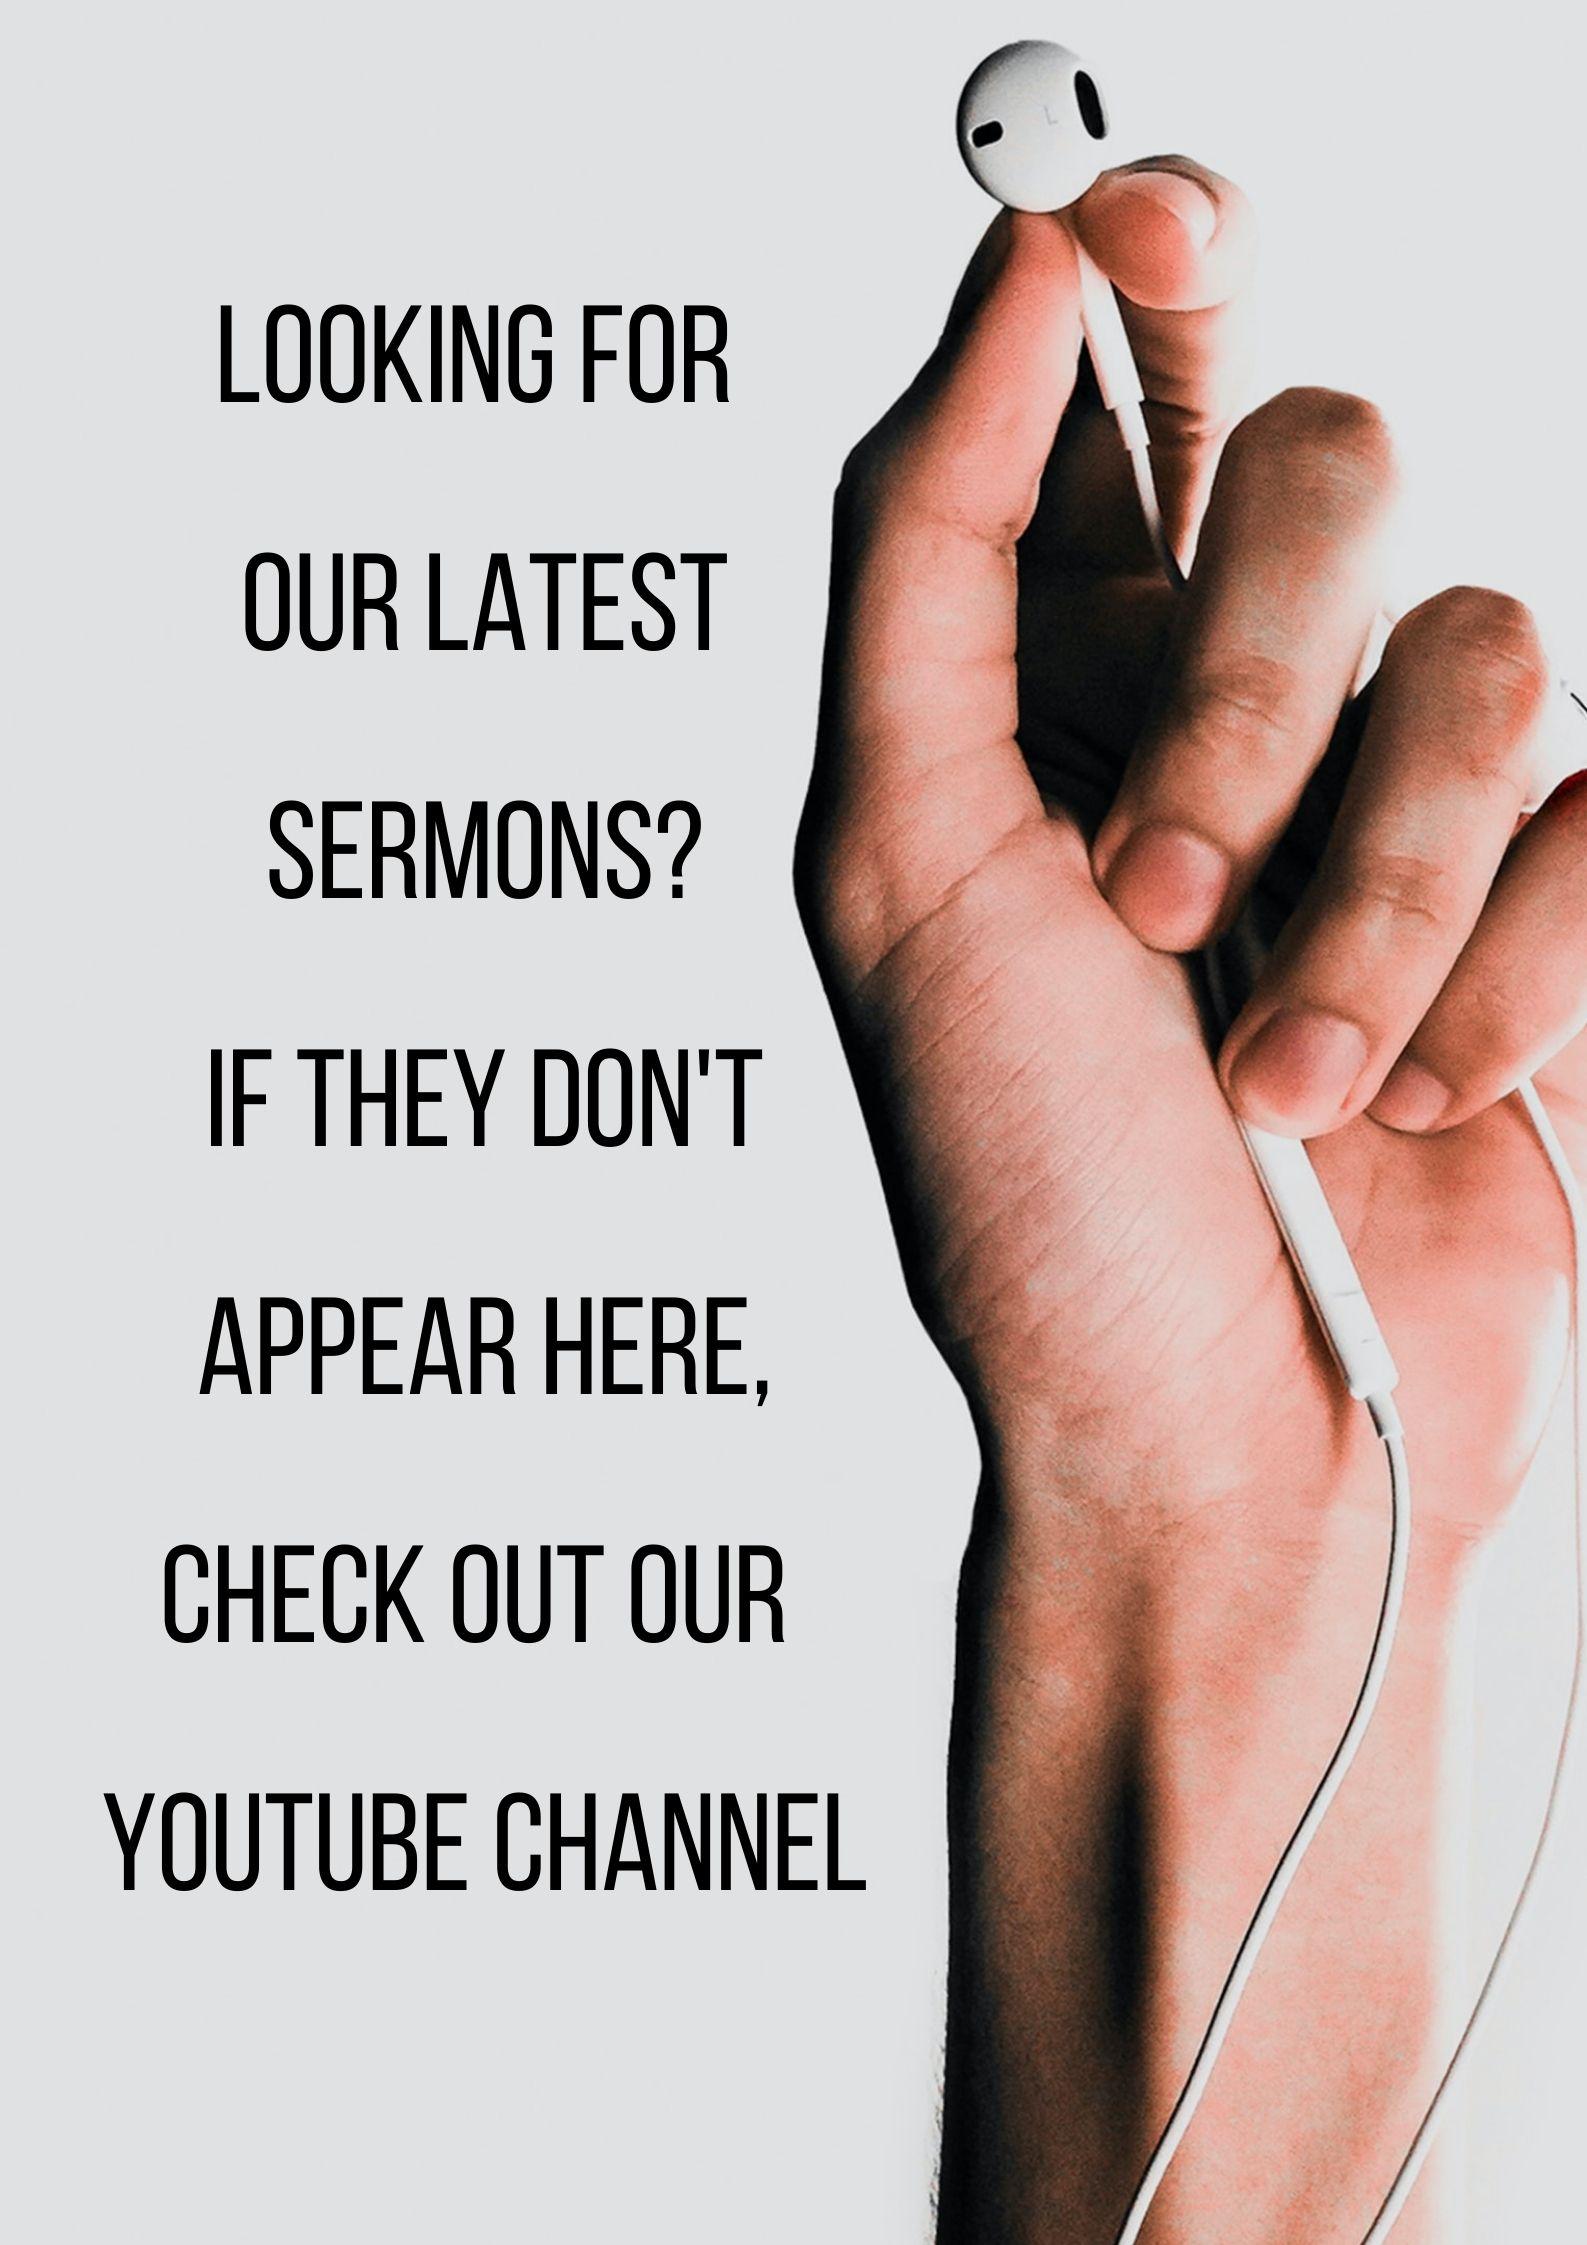 Sermon link